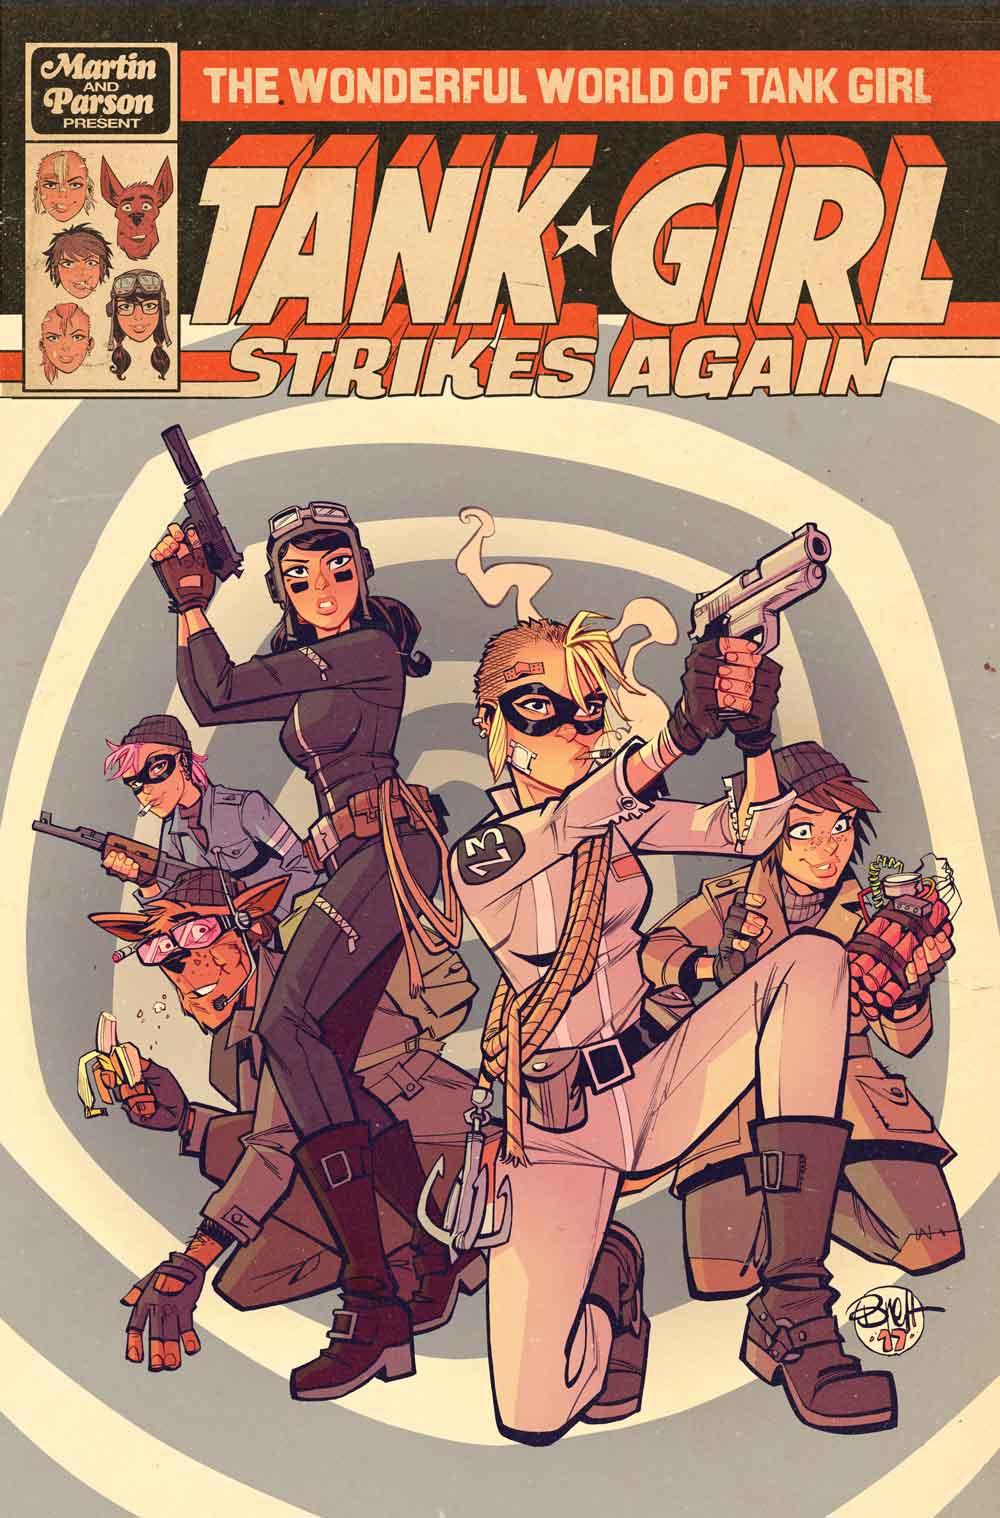 Wonderful-World-Tank-Girl-Cover-A-Parson.jpg